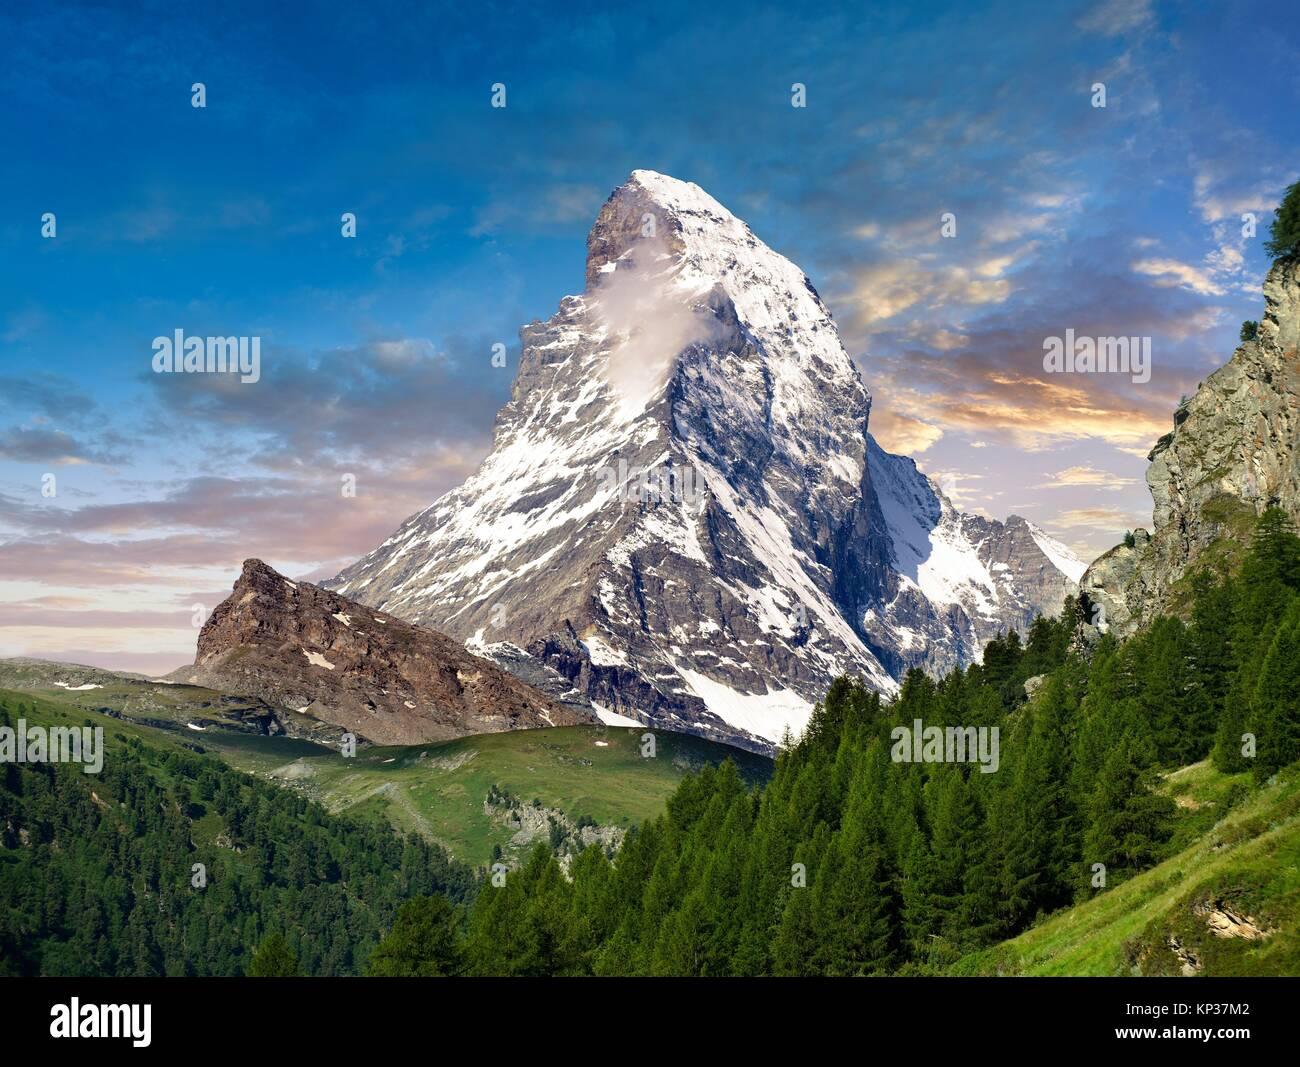 The Matterhorn or Monte Cervino mountain peak, Zermatt, Switzerland. - Stock Image